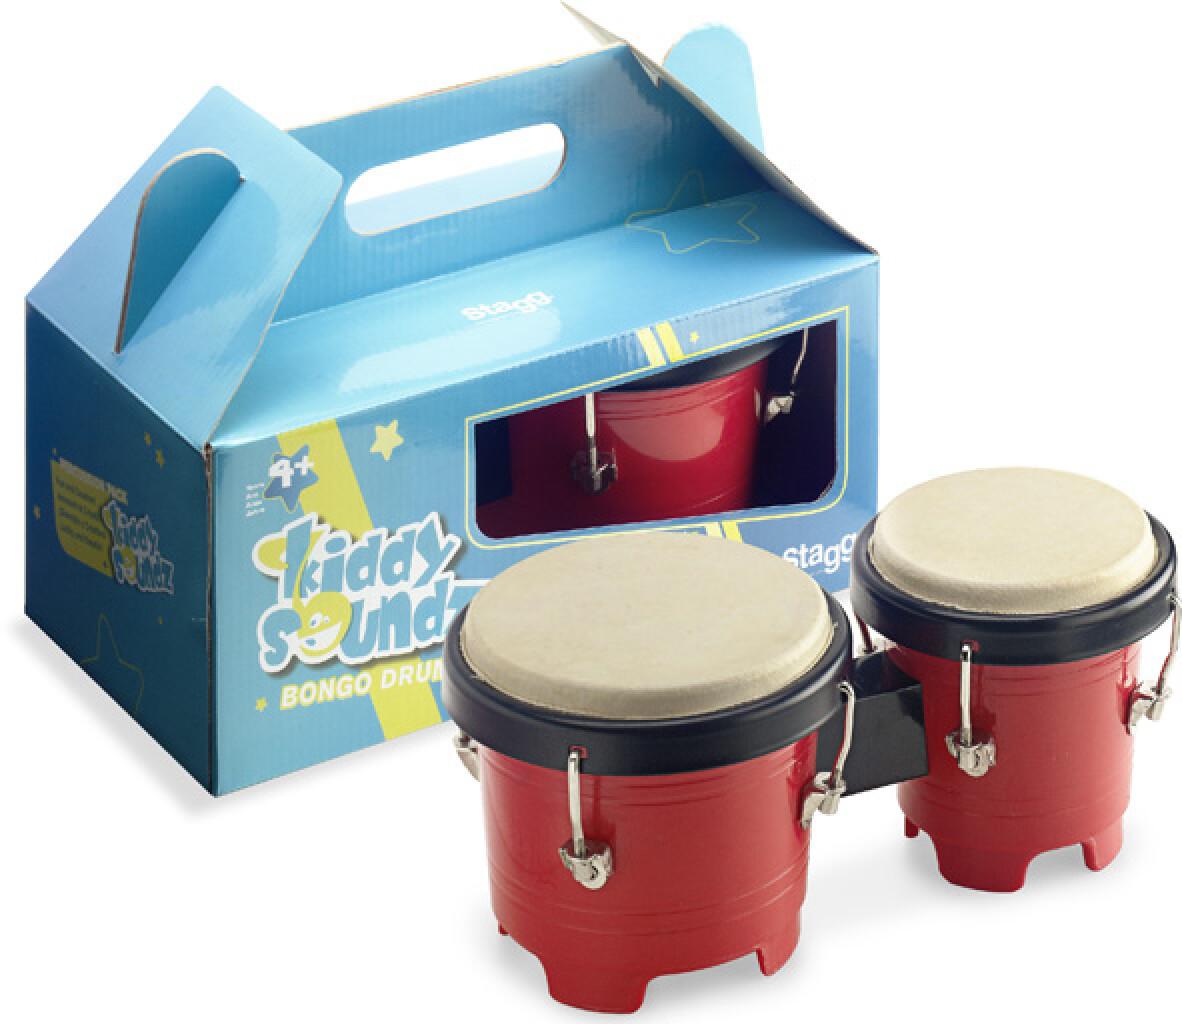 Kiddy soundz children's mini bongo